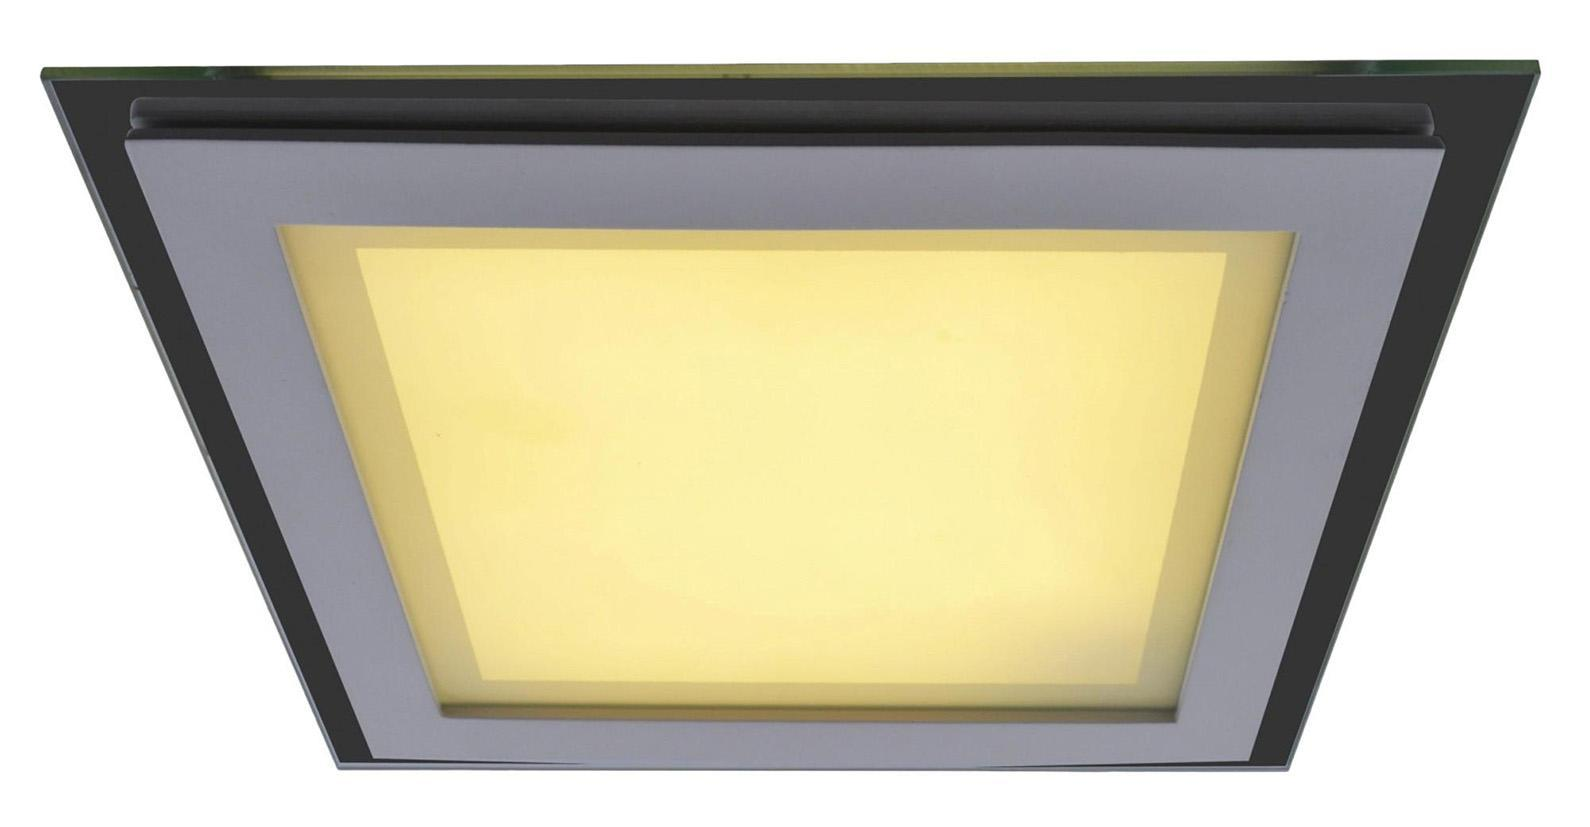 A4018PL-1WH RAGGIO Встраиваемый светильникA4018PL-1WH18W LED; 1440 lm Материал: Арматура: Алюминий / Элемент декора: СтеклоРазмер: 210x210x45Цвет: Белый